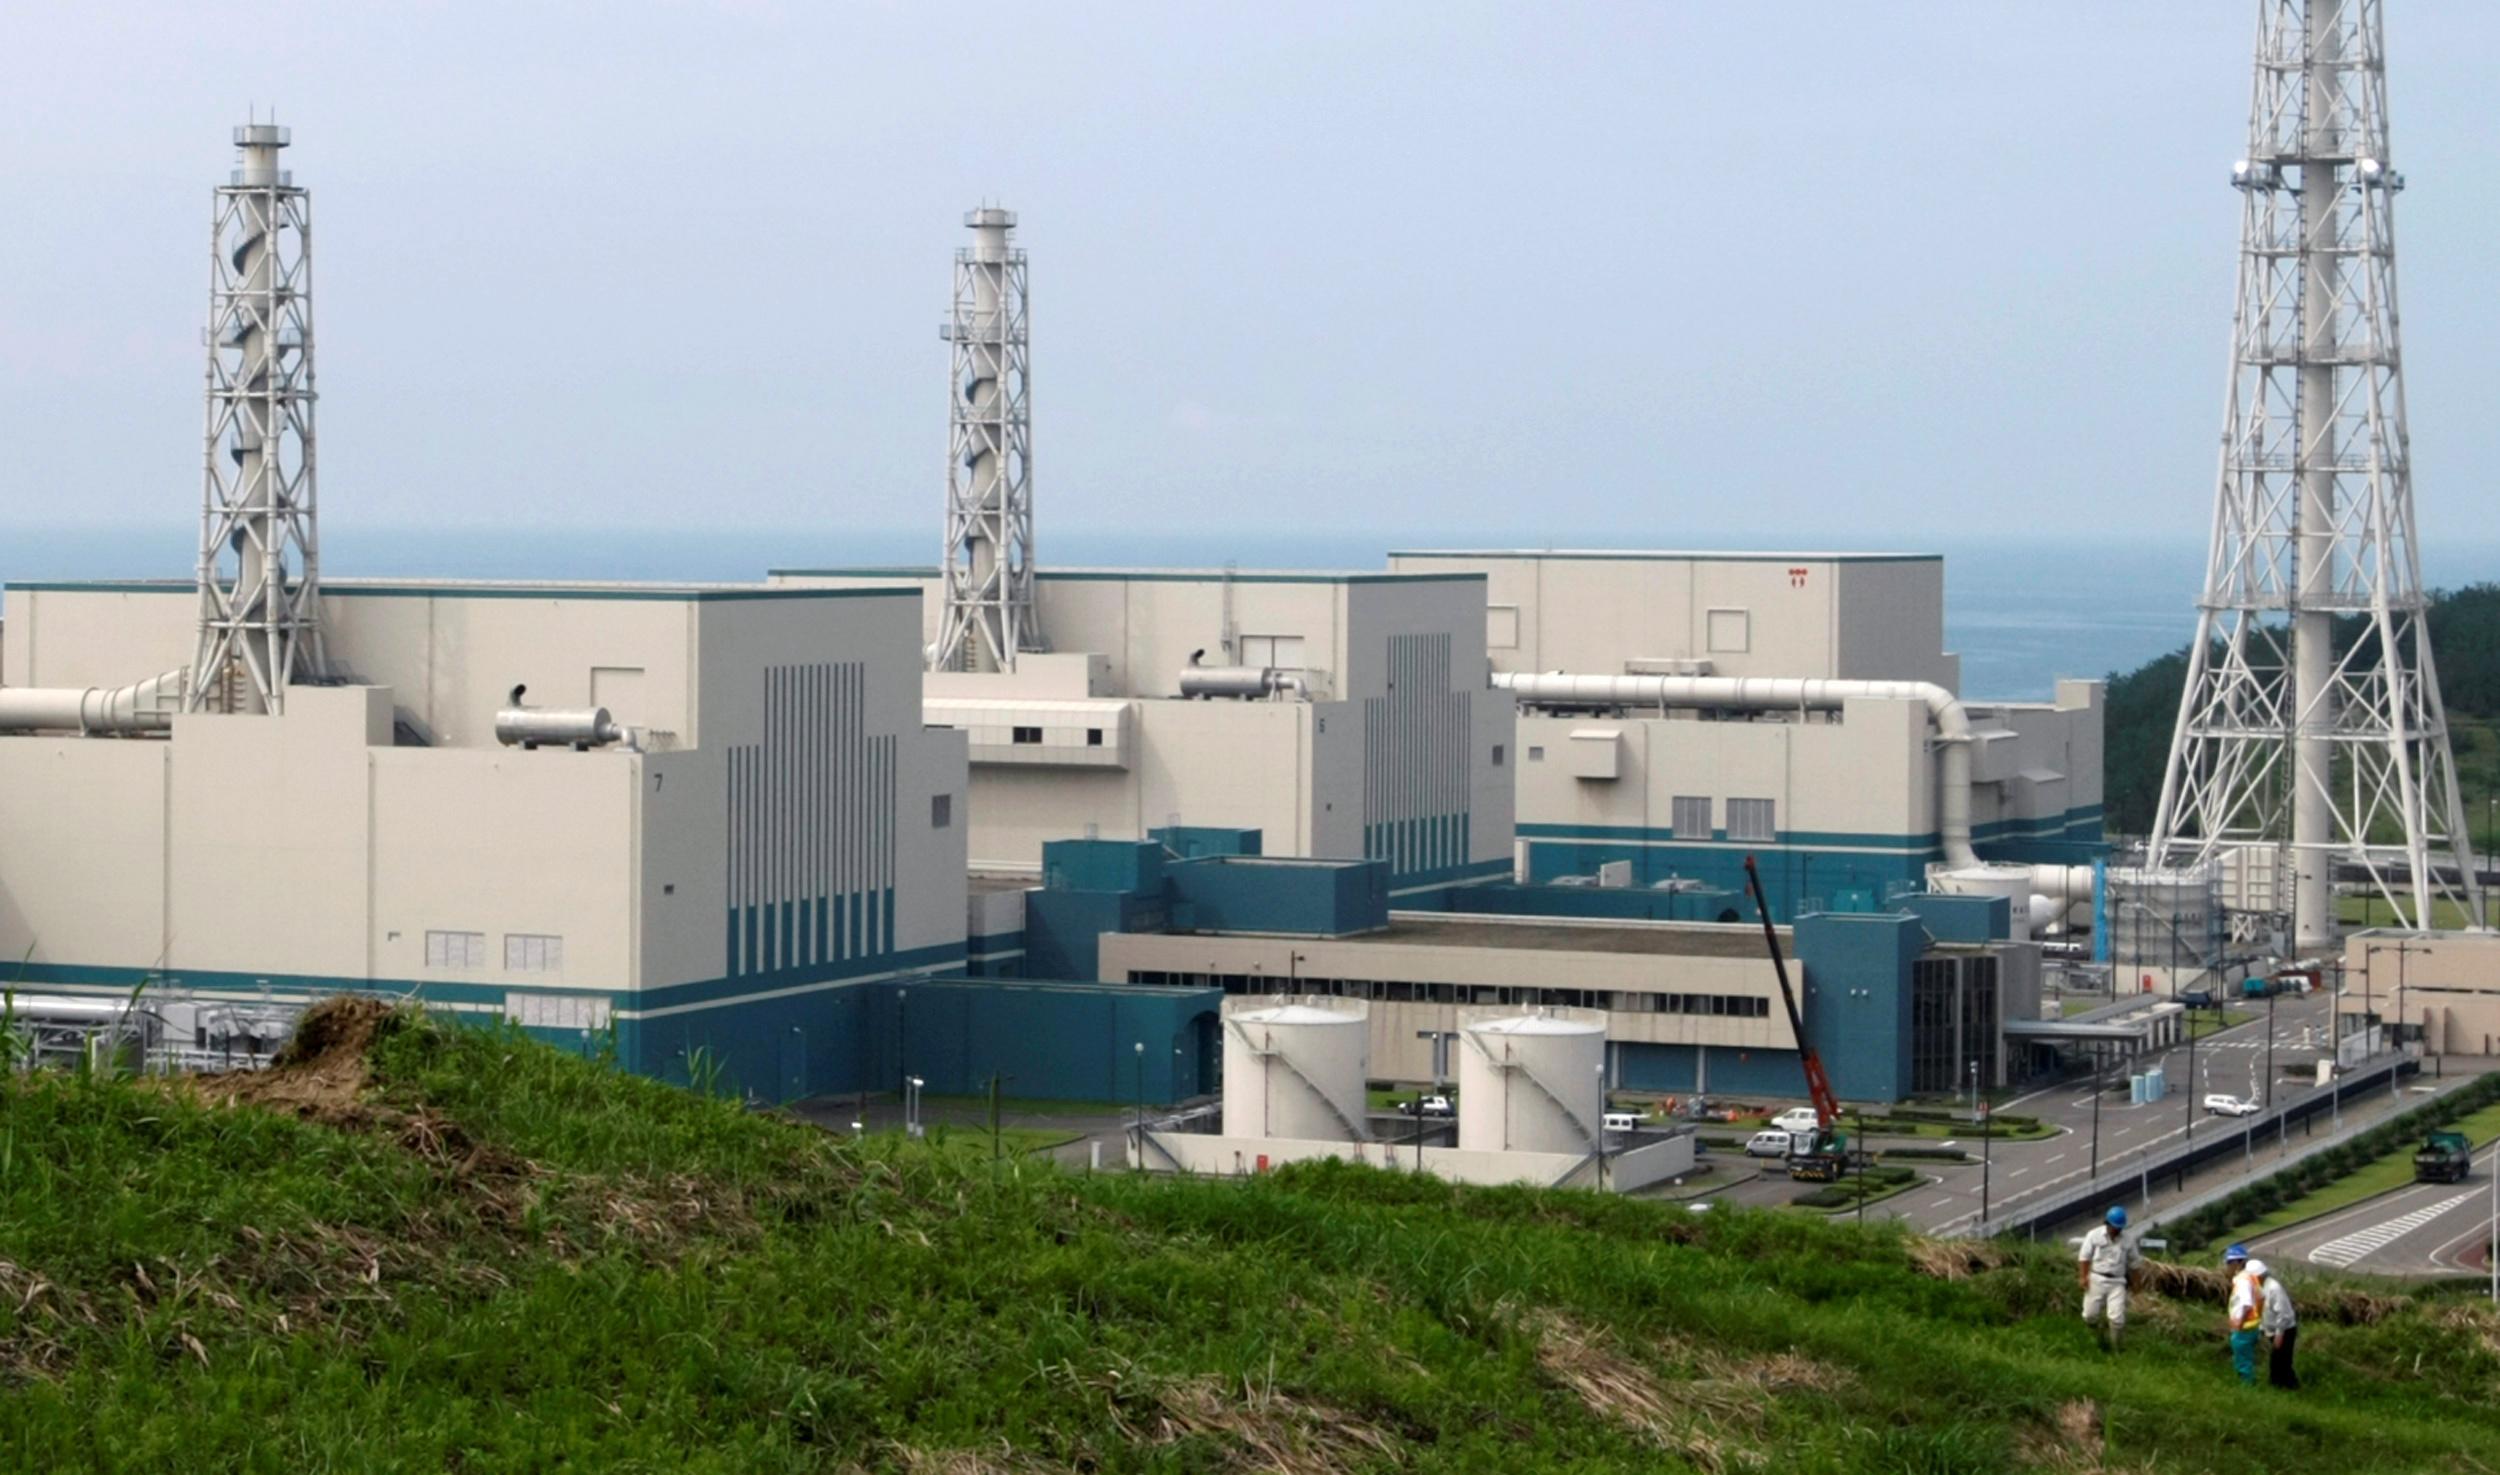 Japan's Tepco may mothball reactors at world's biggest nuke plant